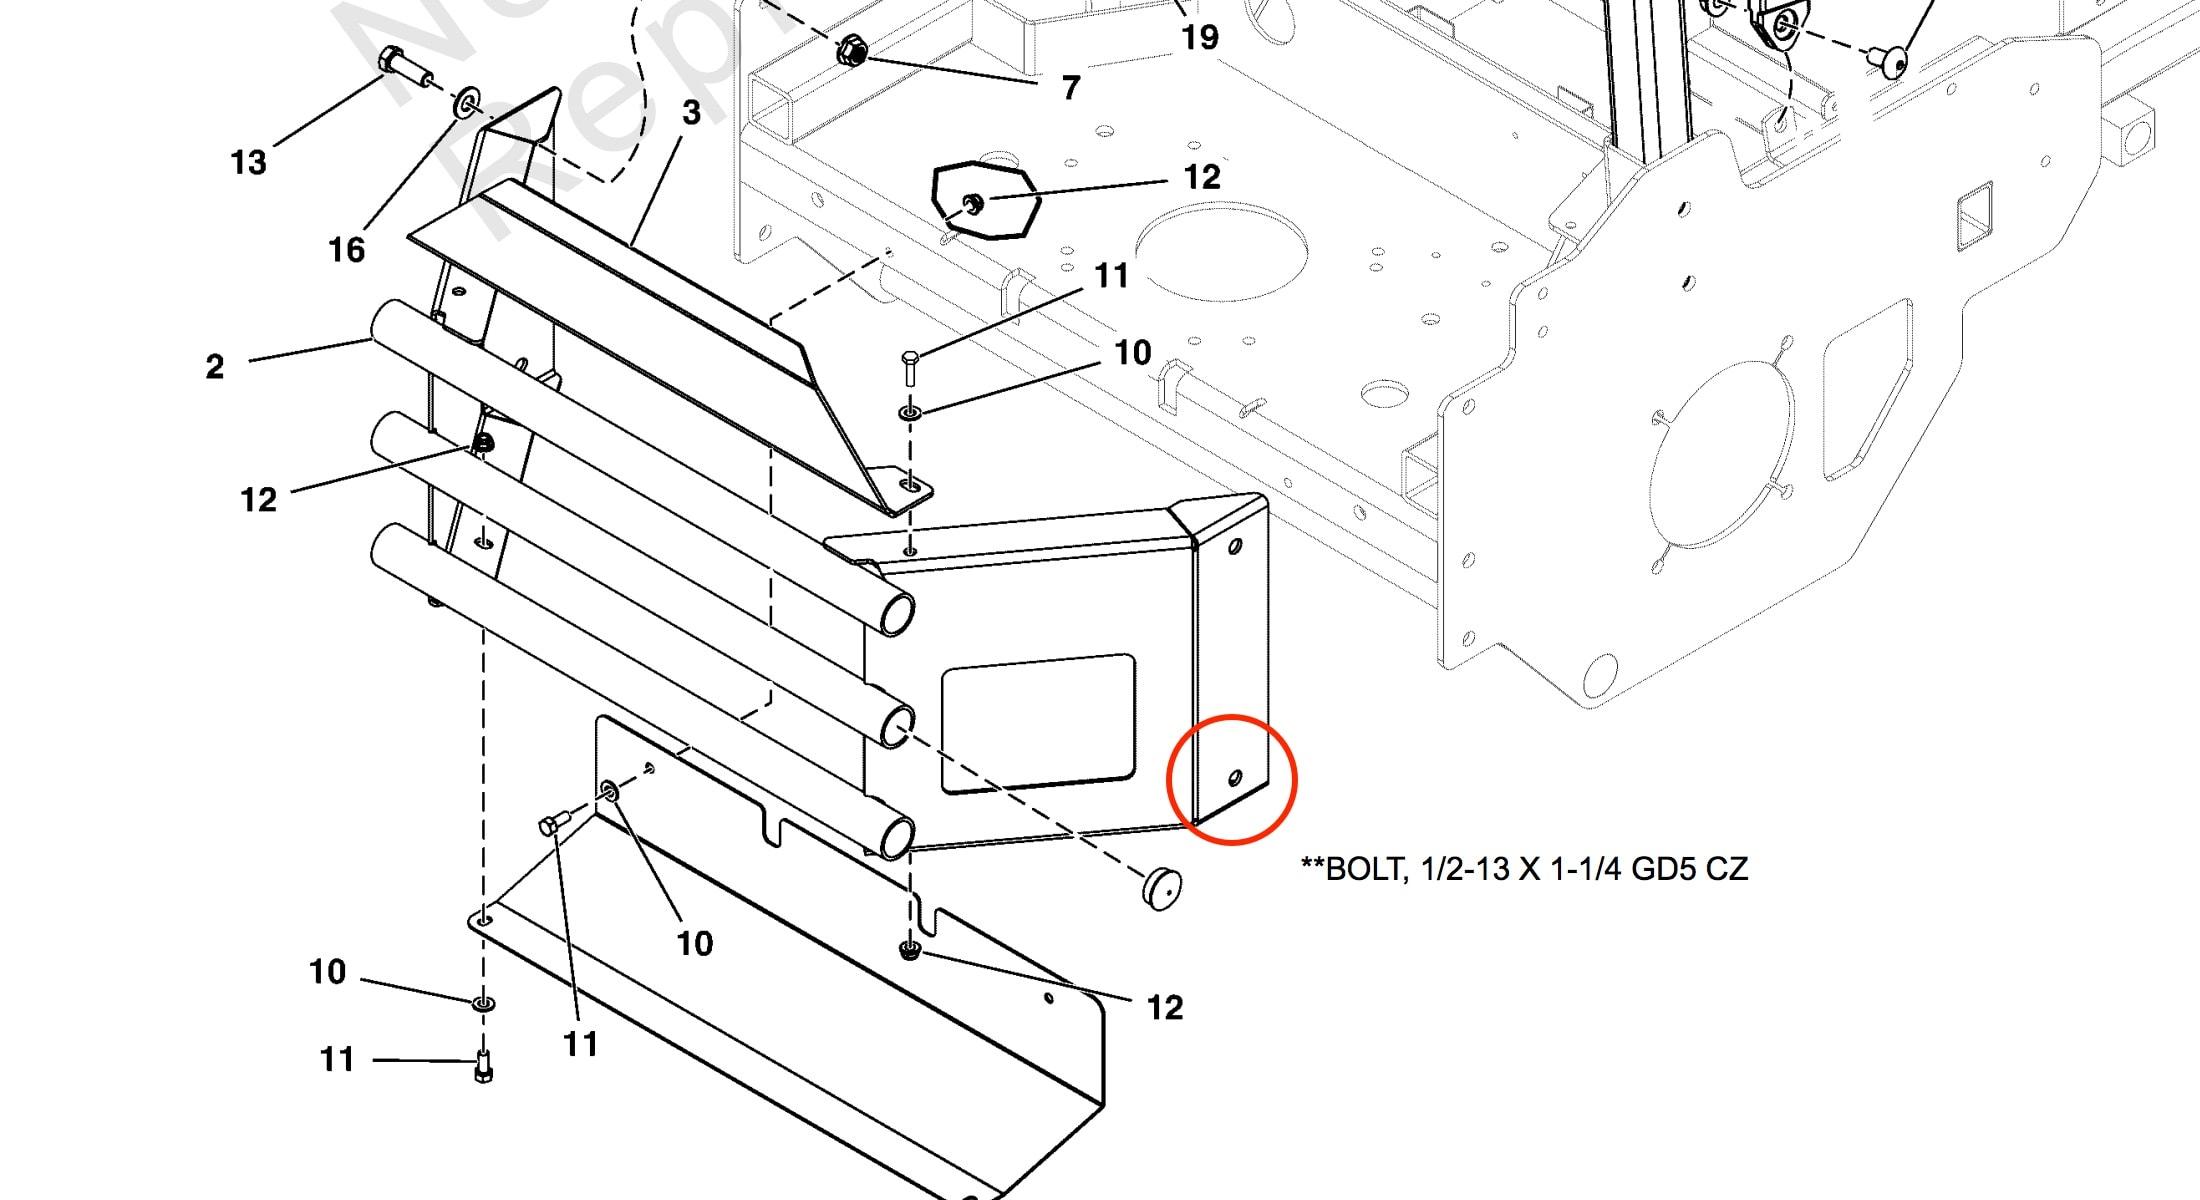 Ferris Mower Schematics - Wiring Diagrams Dock